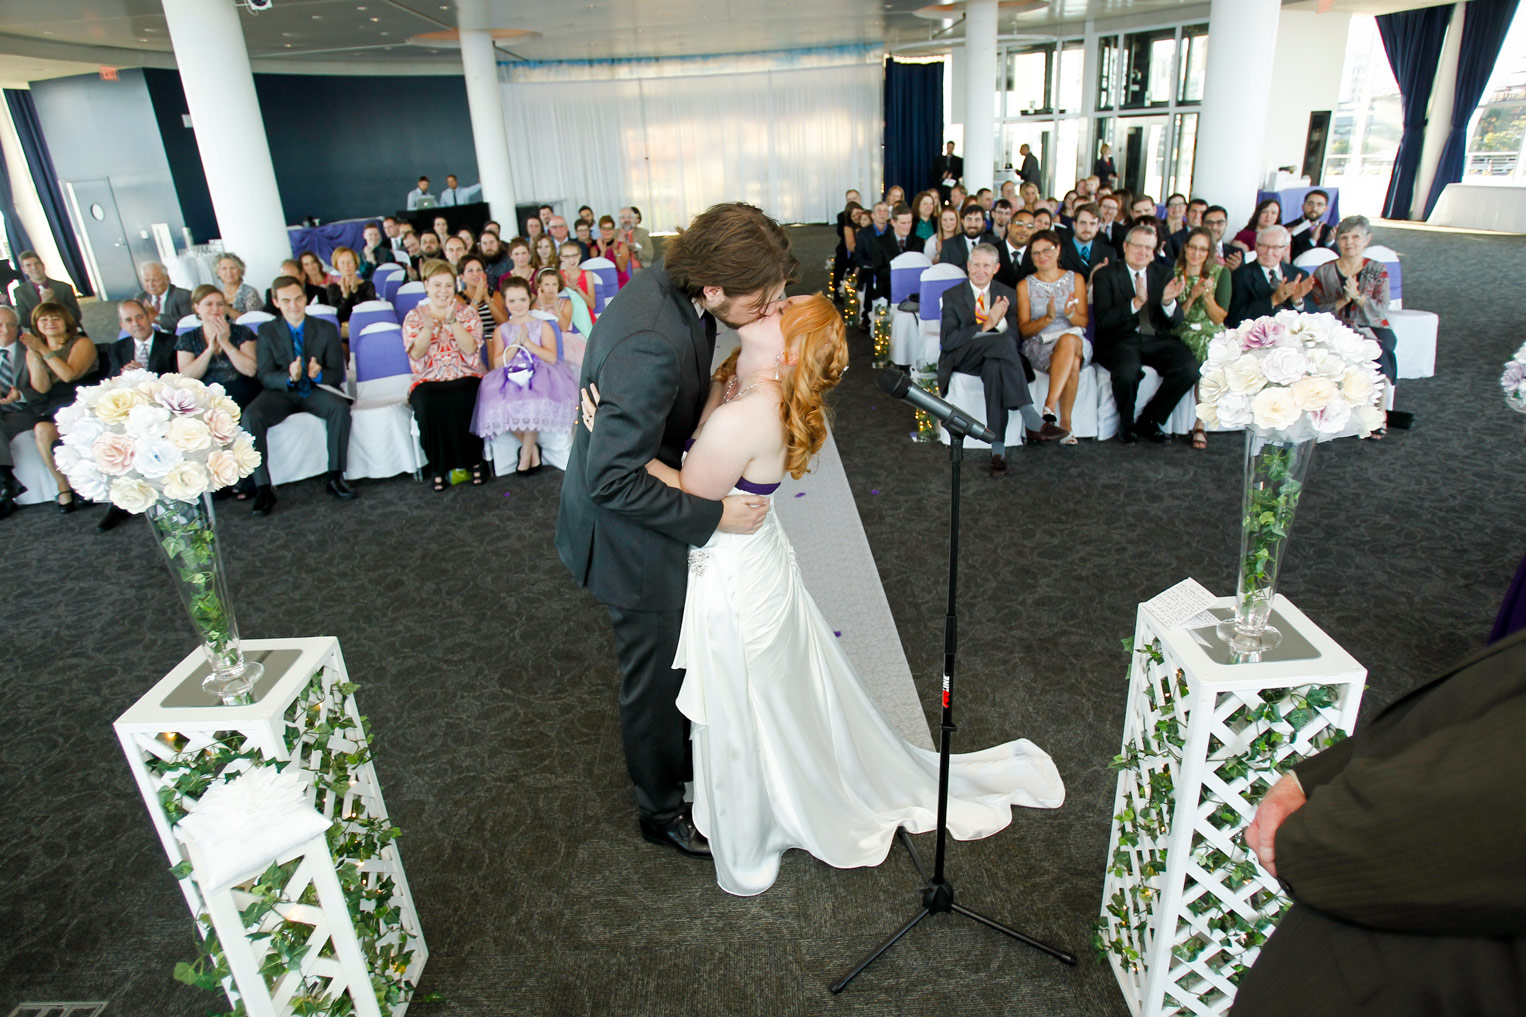 milwaukee-discovery-world-pier-wisconsin-wedding-ruthie-hauge-photography-36.jpg